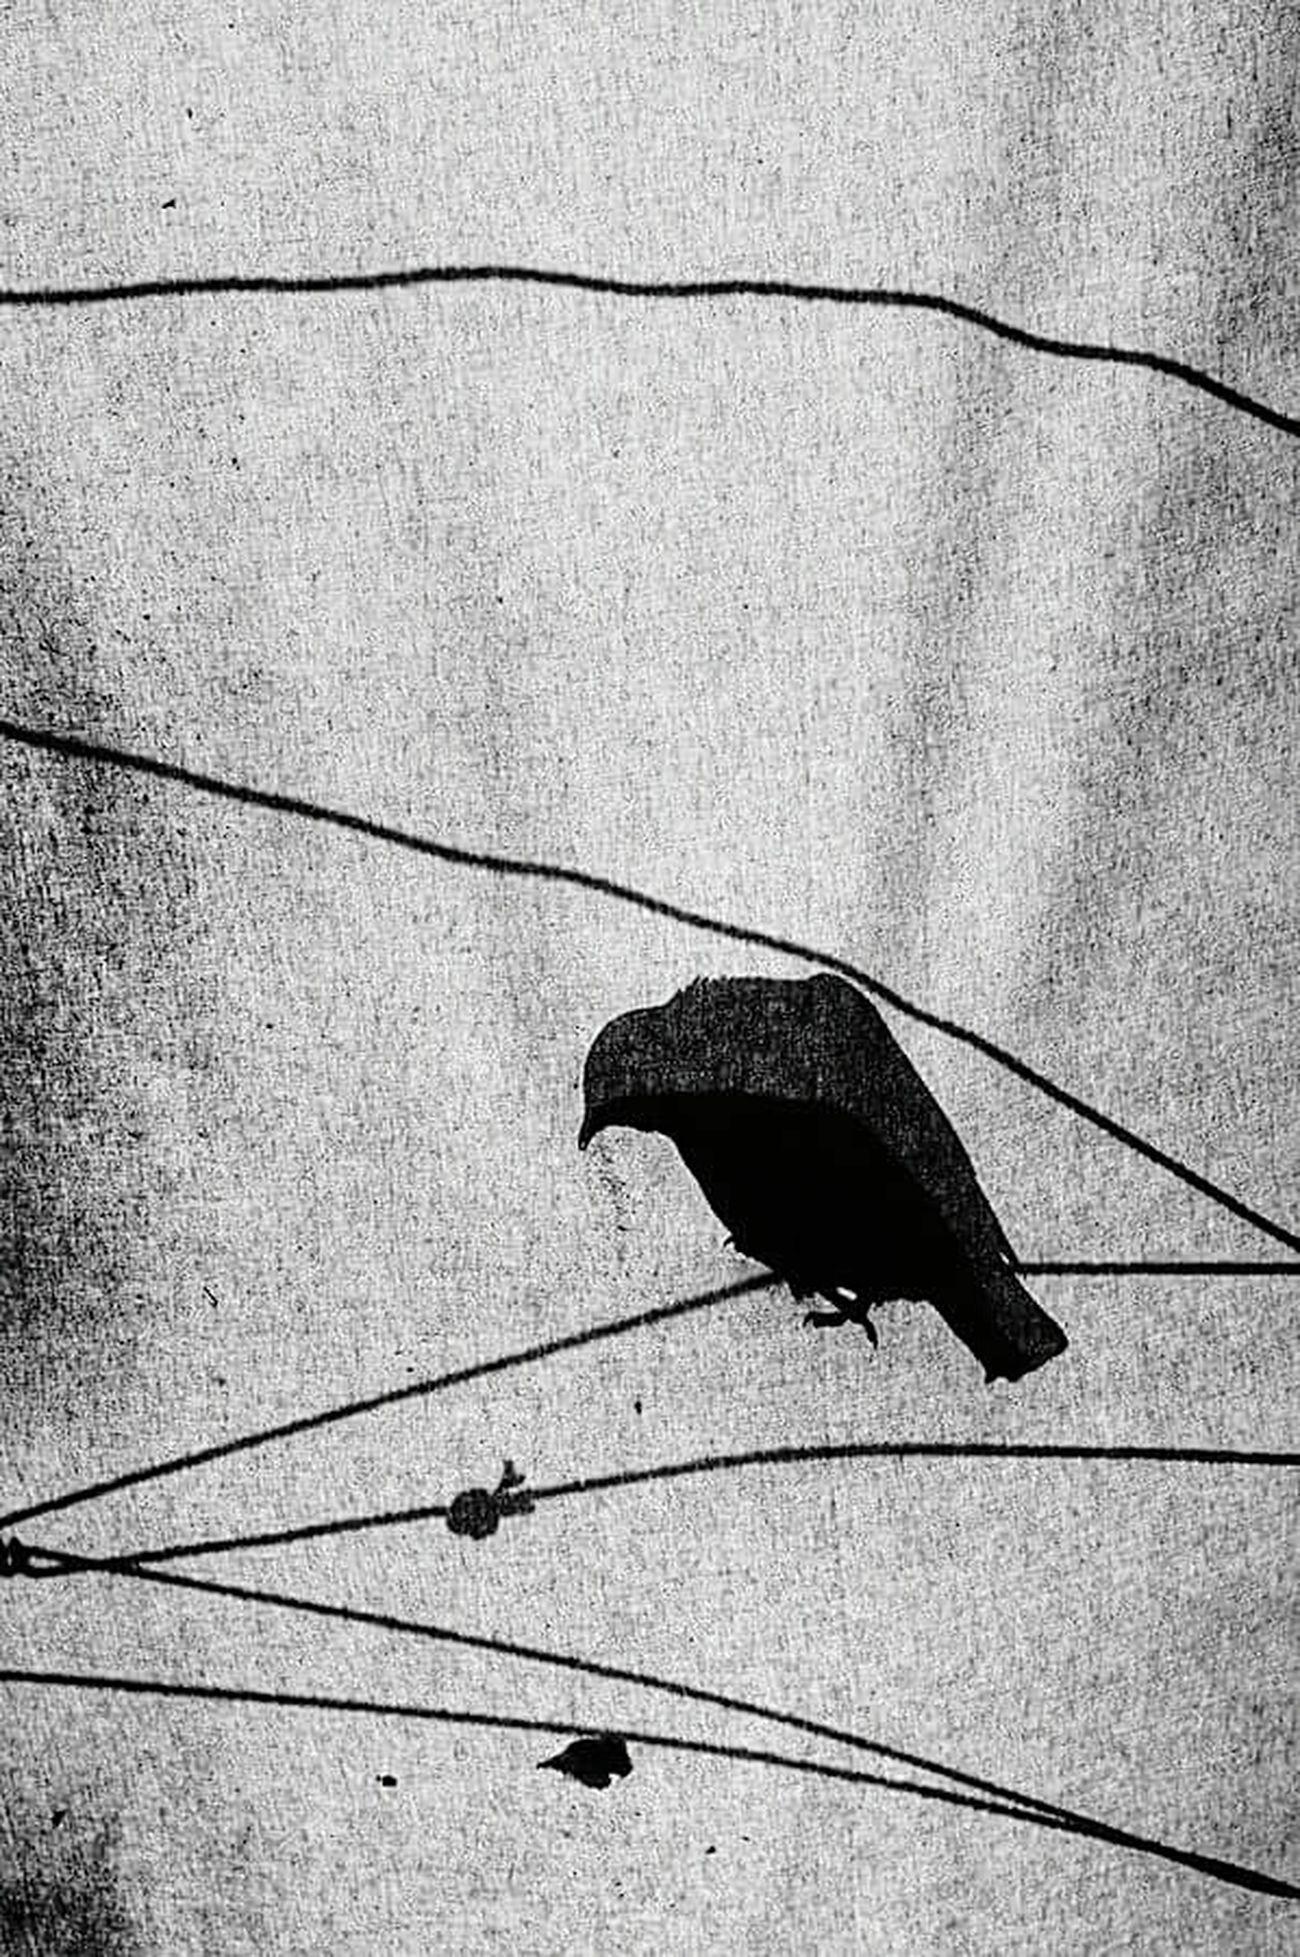 One Animal Close-up Bird Photography Bird Shadow Shadows And Backlighting Shadows & Light Turkey Konya Konyagram Naturmort Light Live Black & White Siyah&beyaz  Fotografie